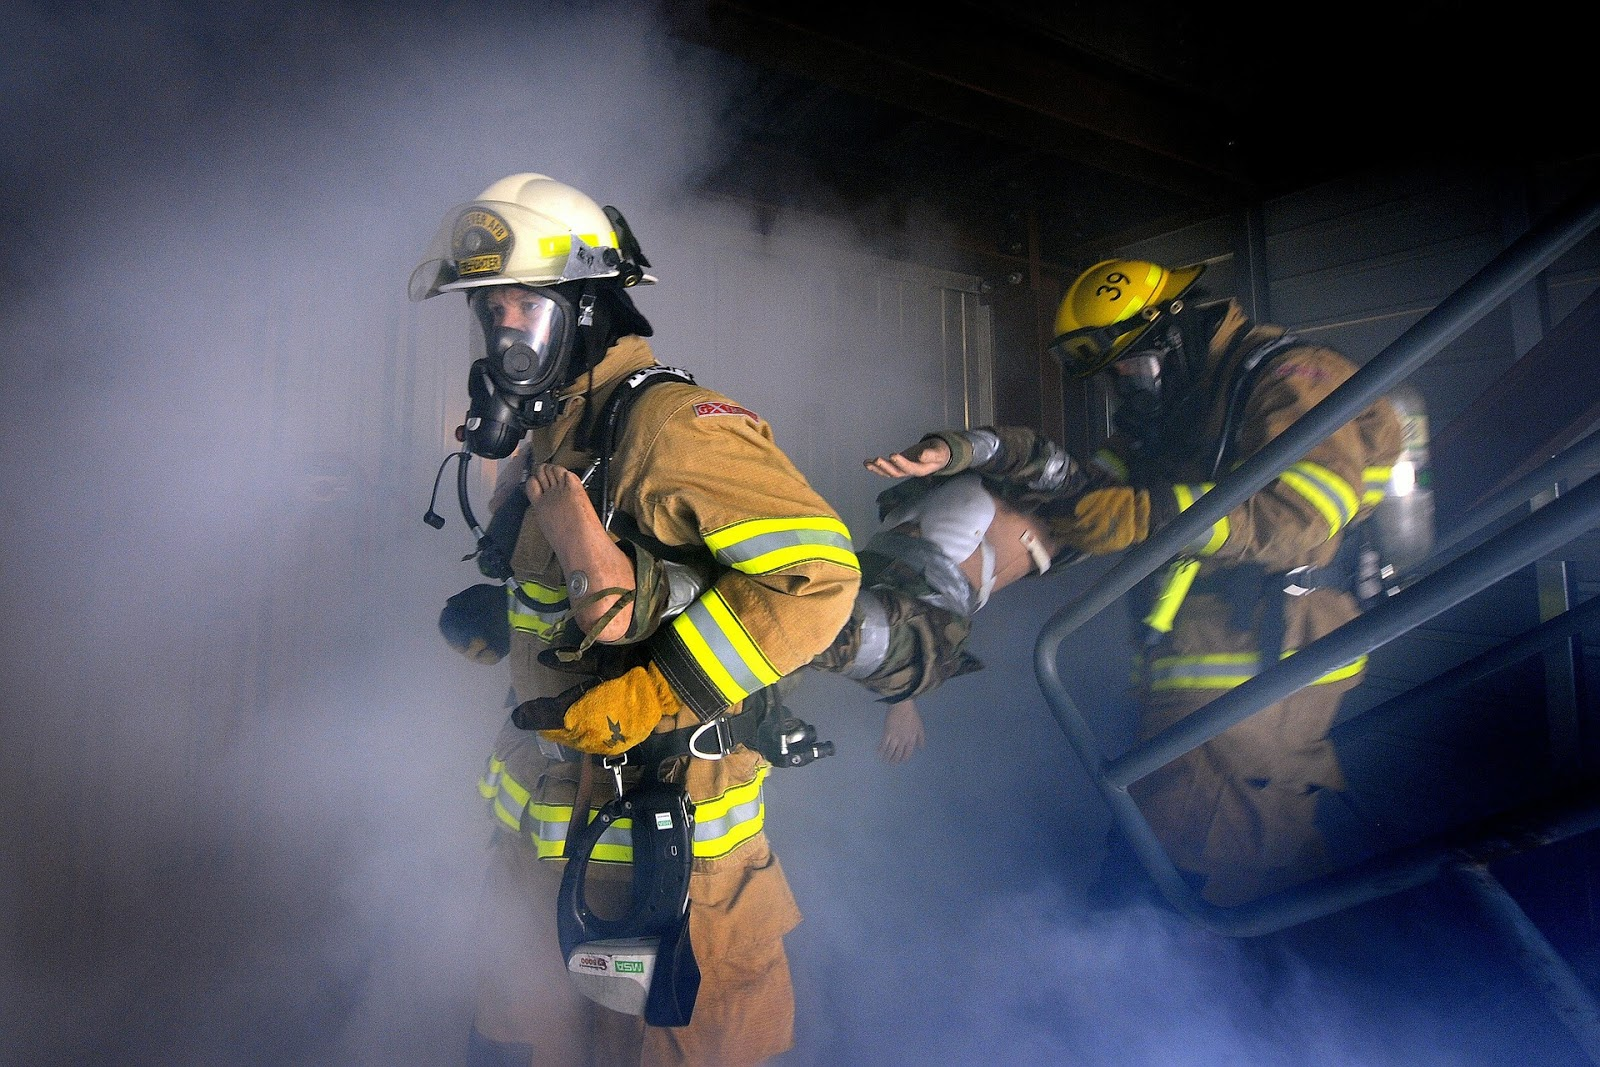 Firefighter by David Mark